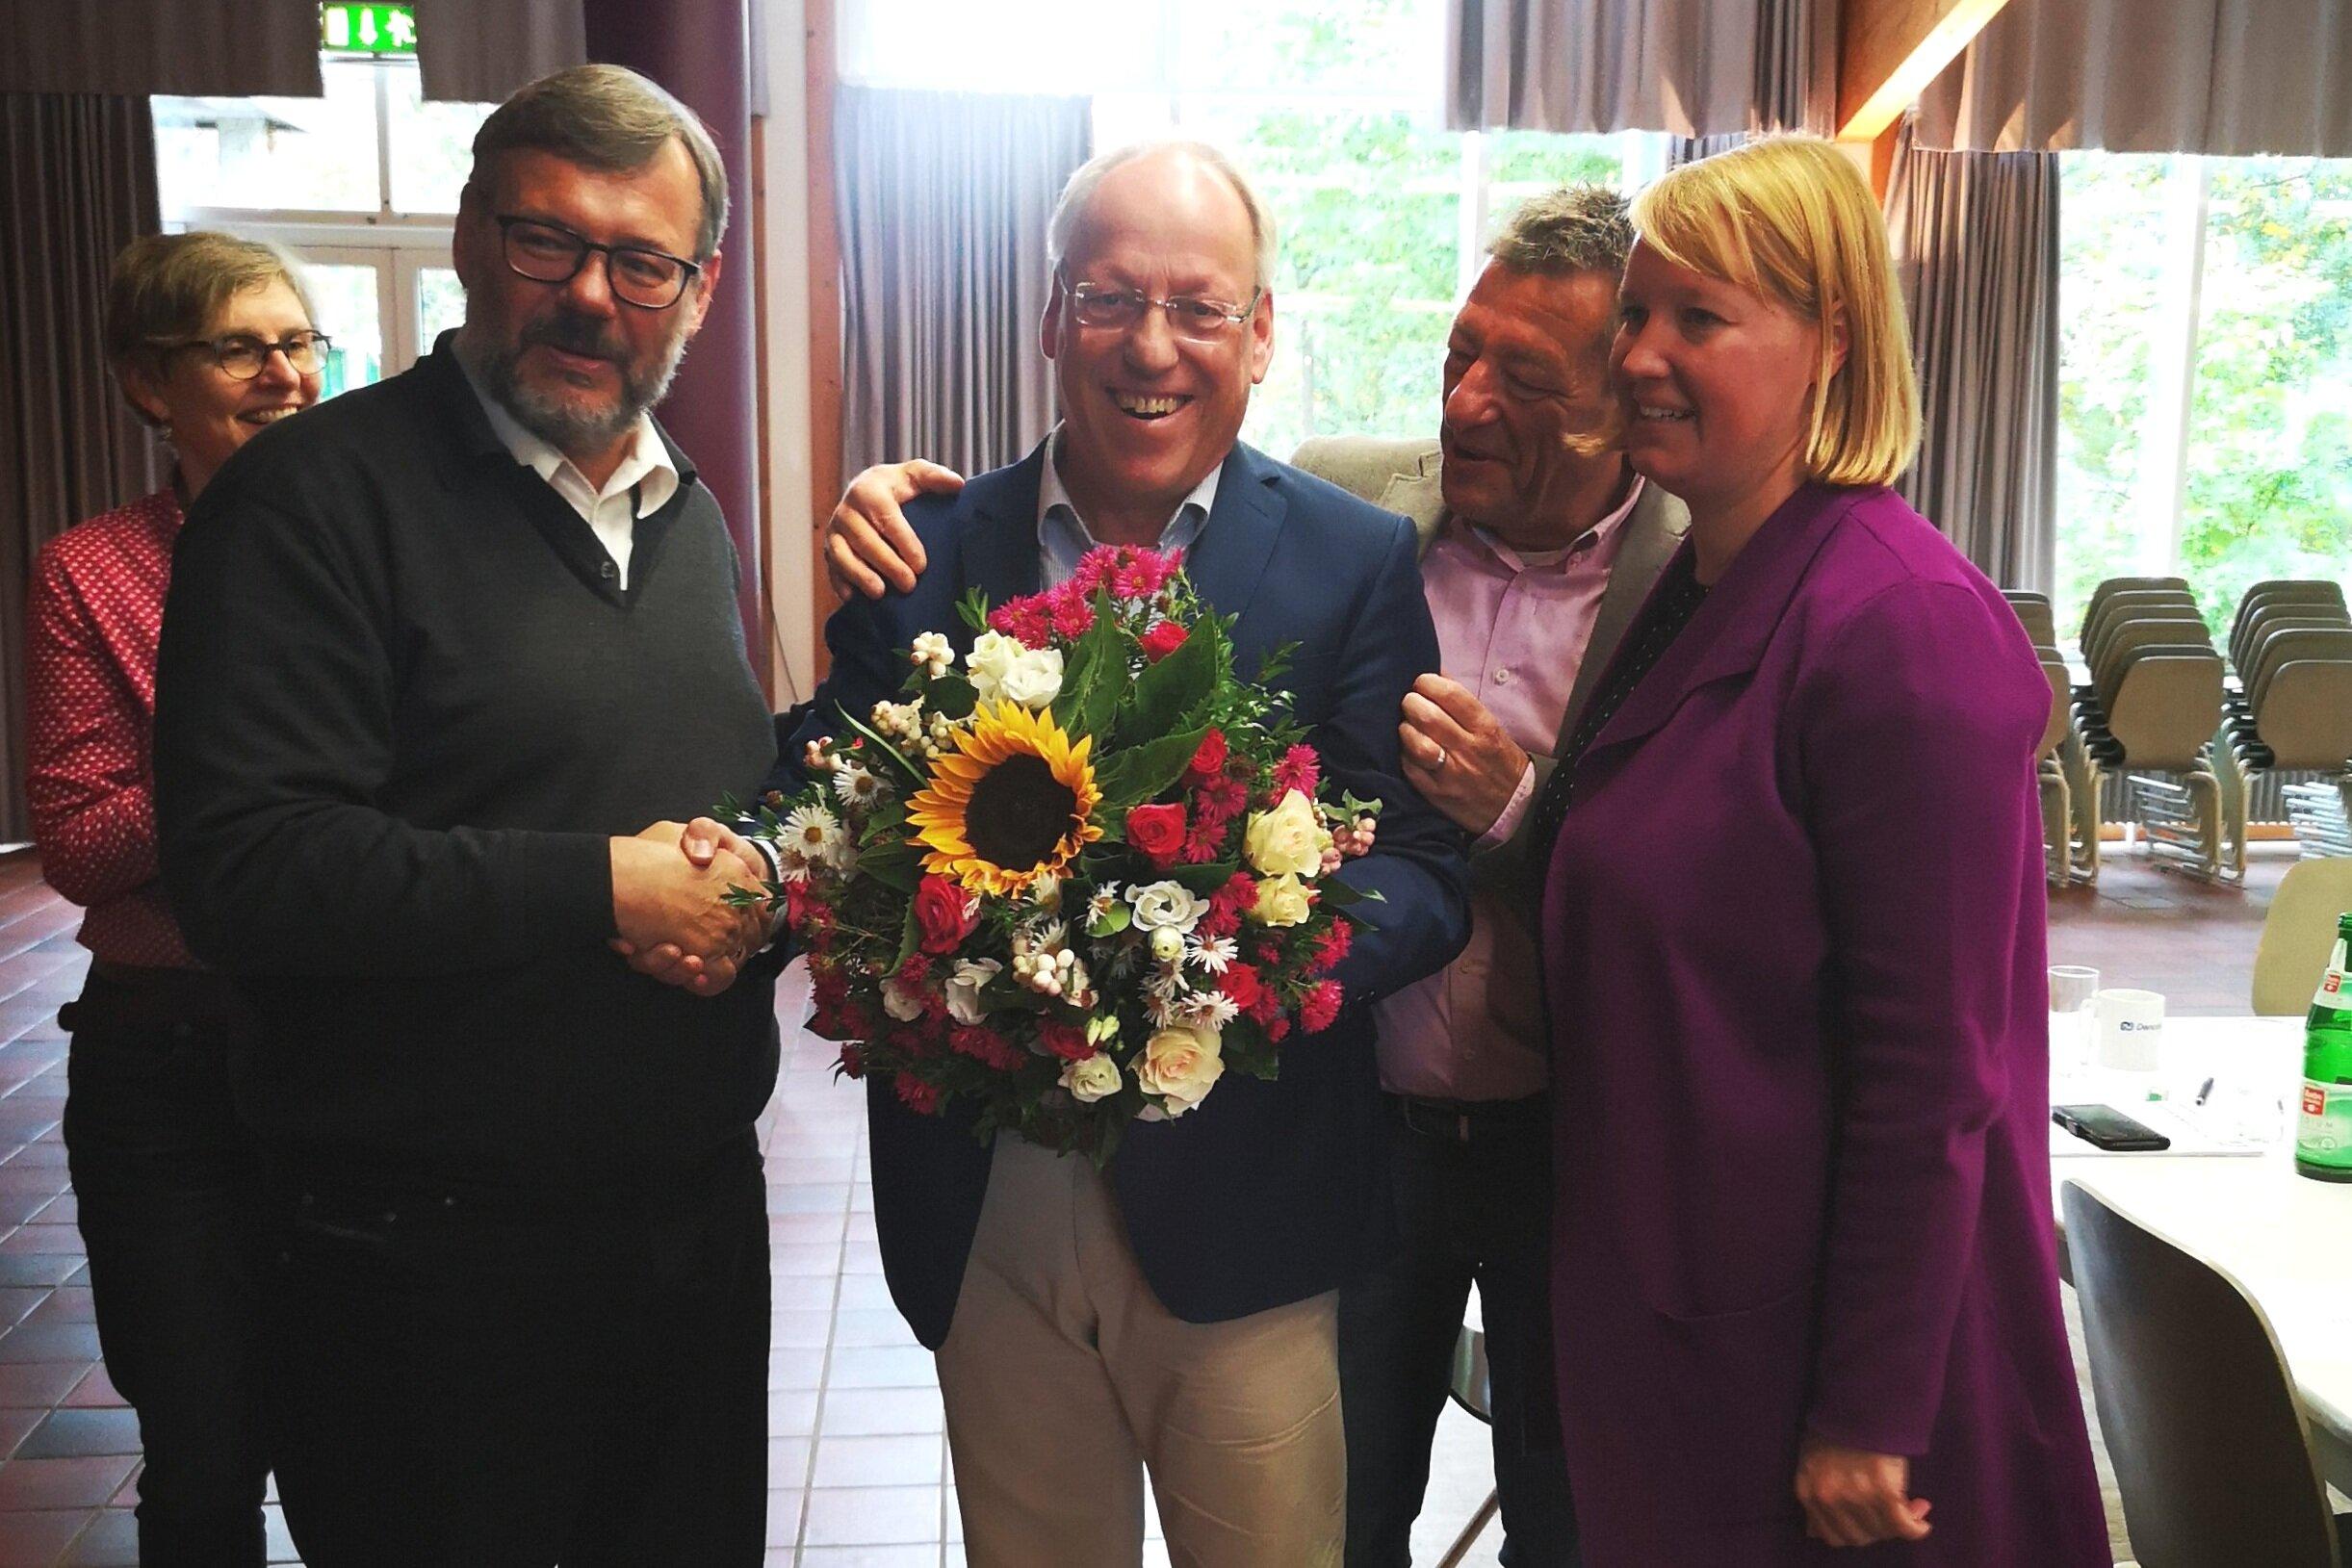 (v.l.) Regina kopp-Herr MdL, Georg Fortmeier MdL, Pit Clausen OB, Thomas Sopp, Wiebke Esdar MdB